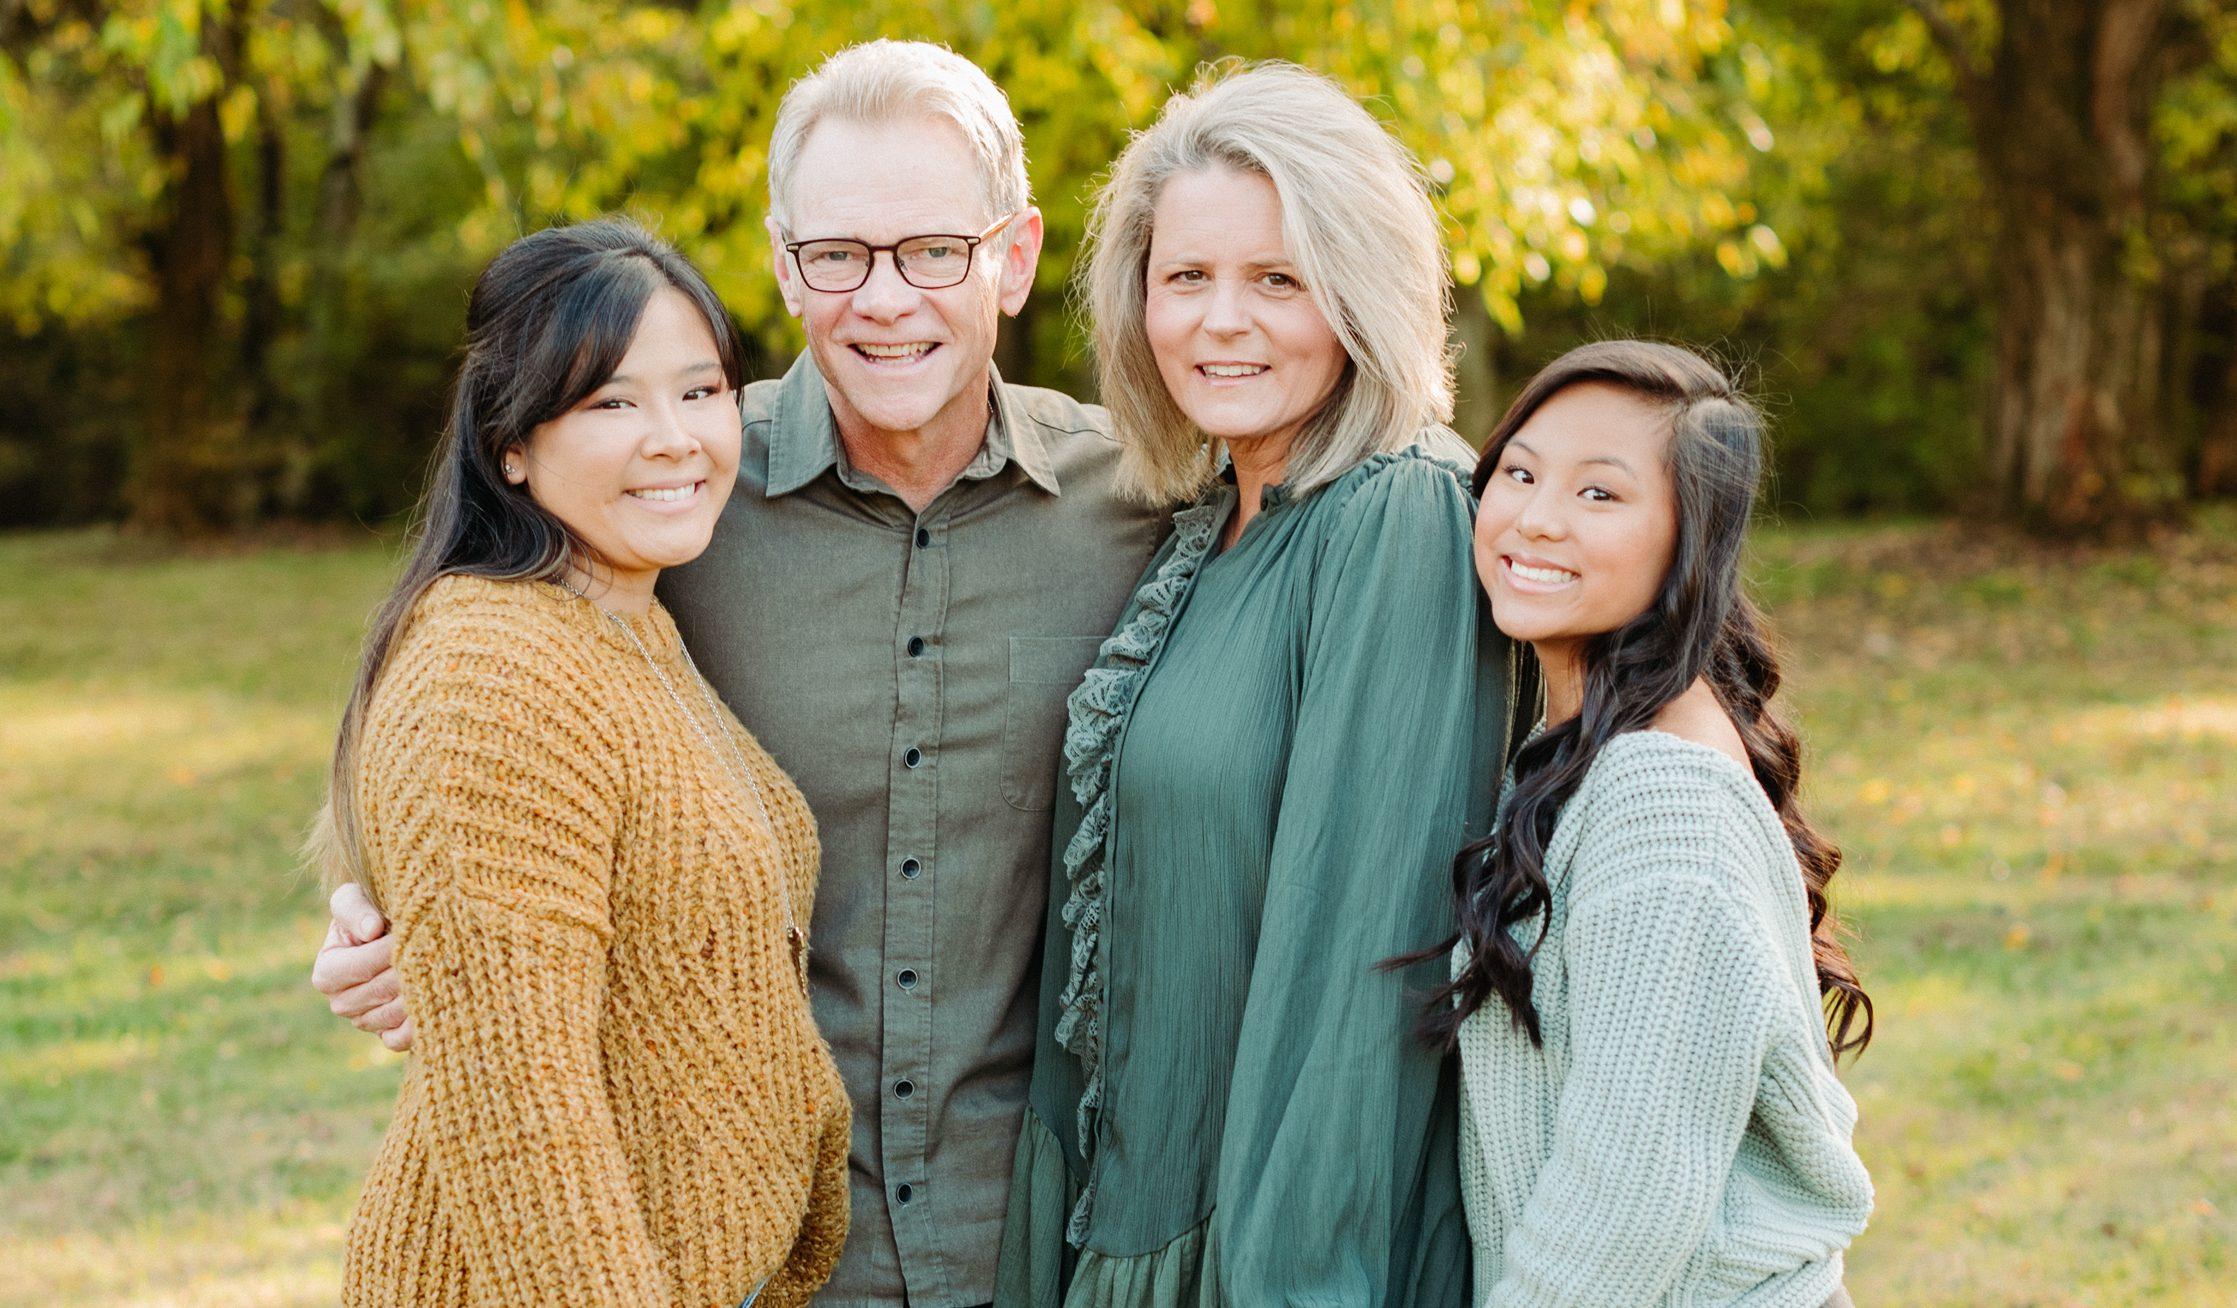 The Chapman Family | Adoption Aid Grants